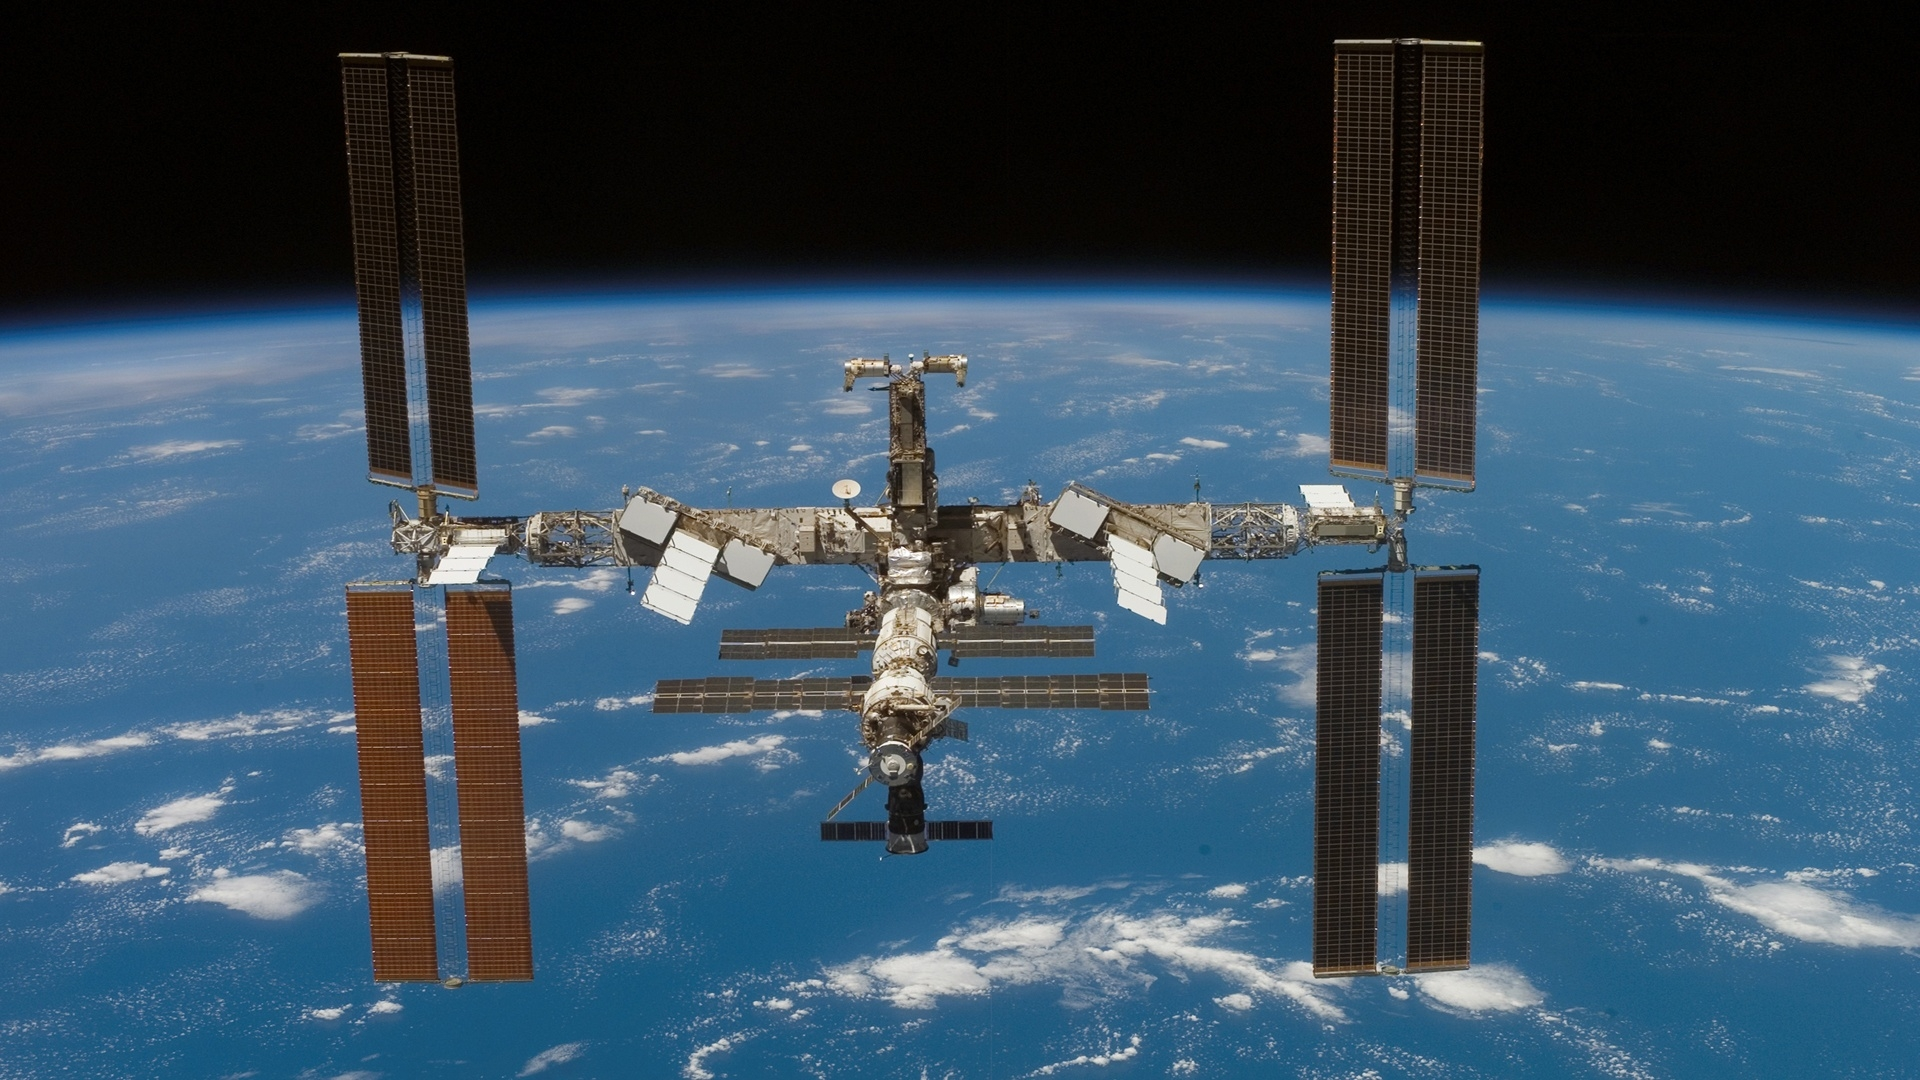 ISS Made It's 100,000th Orbit Around Earth - Equivalent Of 2.6 billion Miles!!